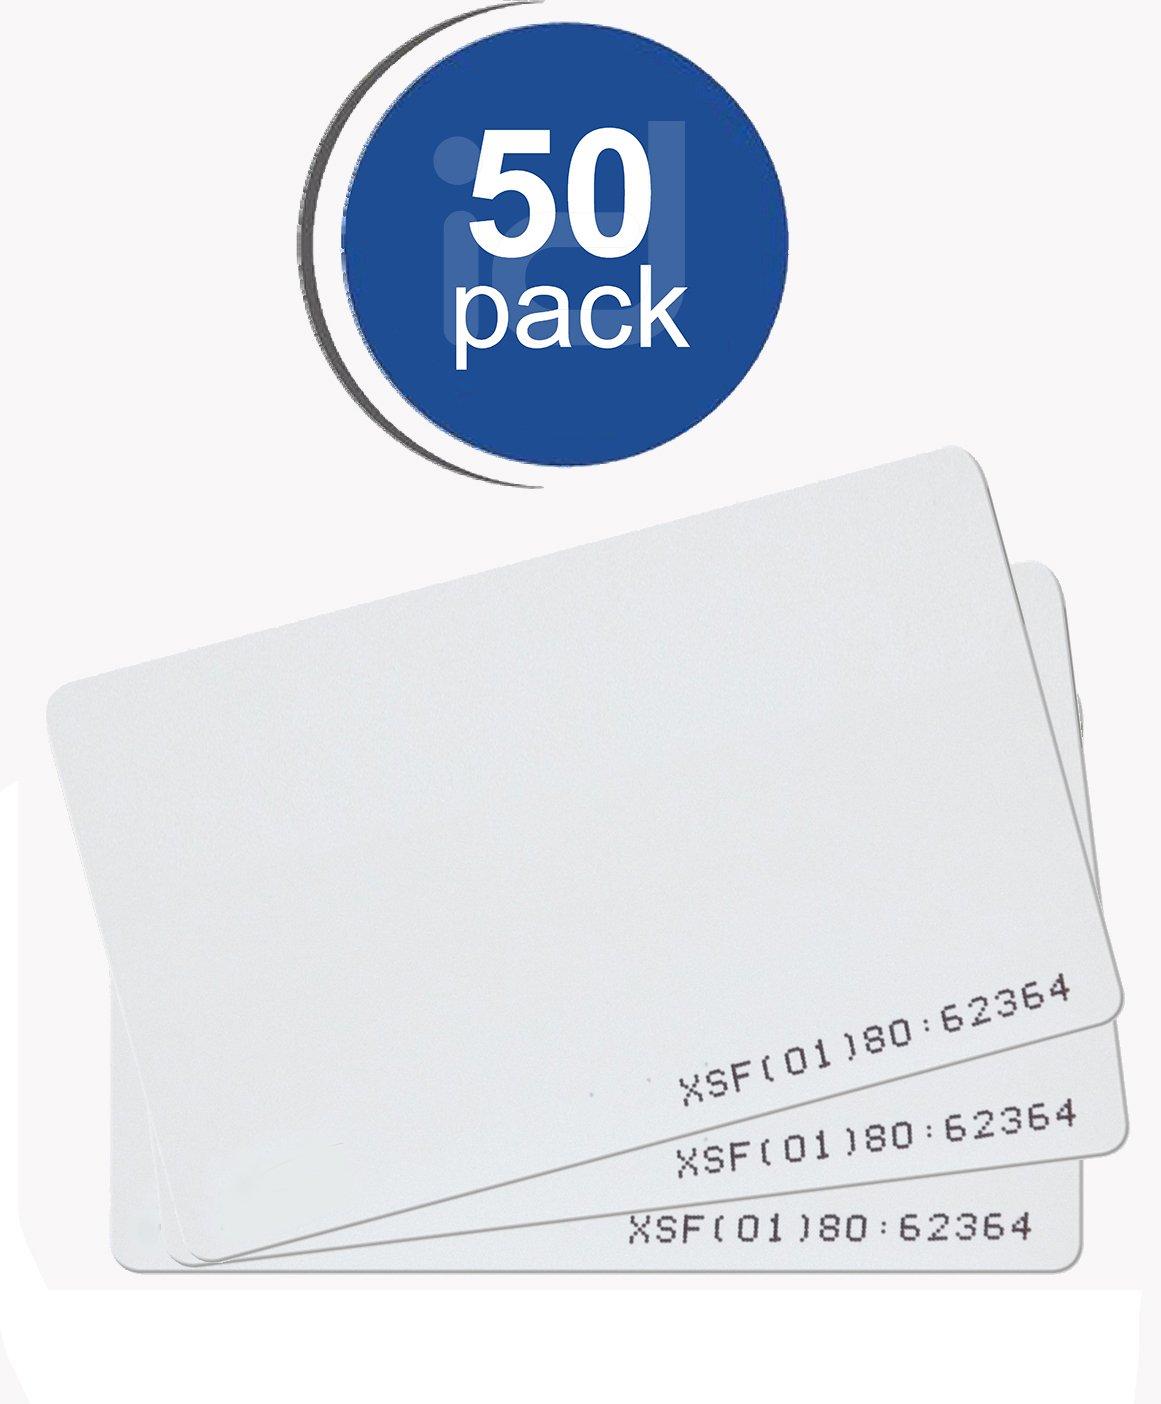 Kantech ioProx P20DYE Imageable Proximity Card (50PK, RapidPROX)